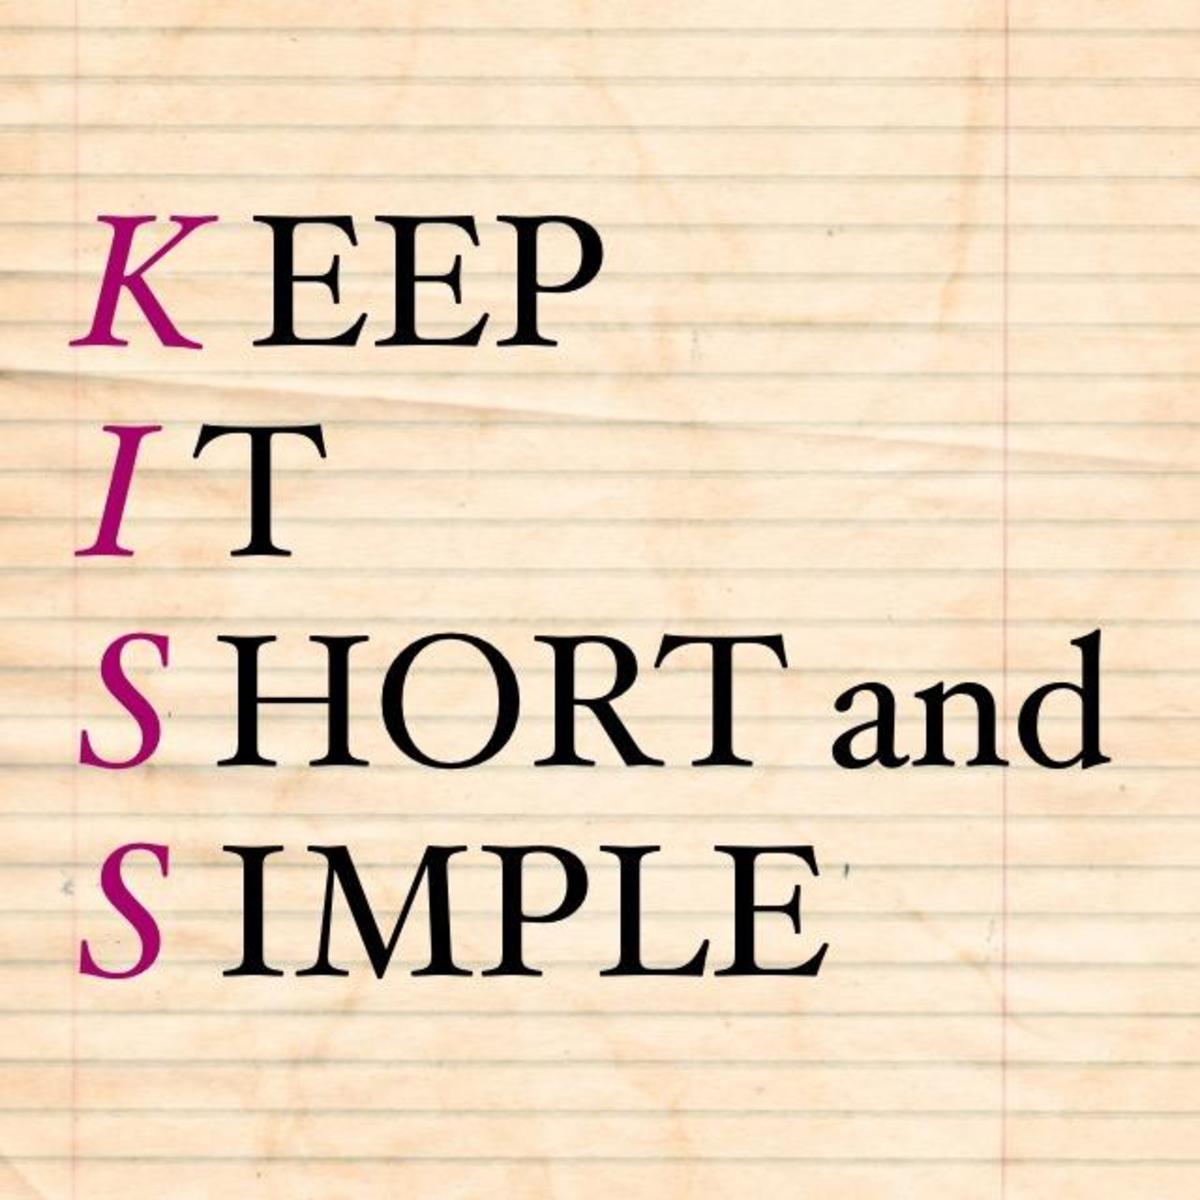 Use the KISS Rule